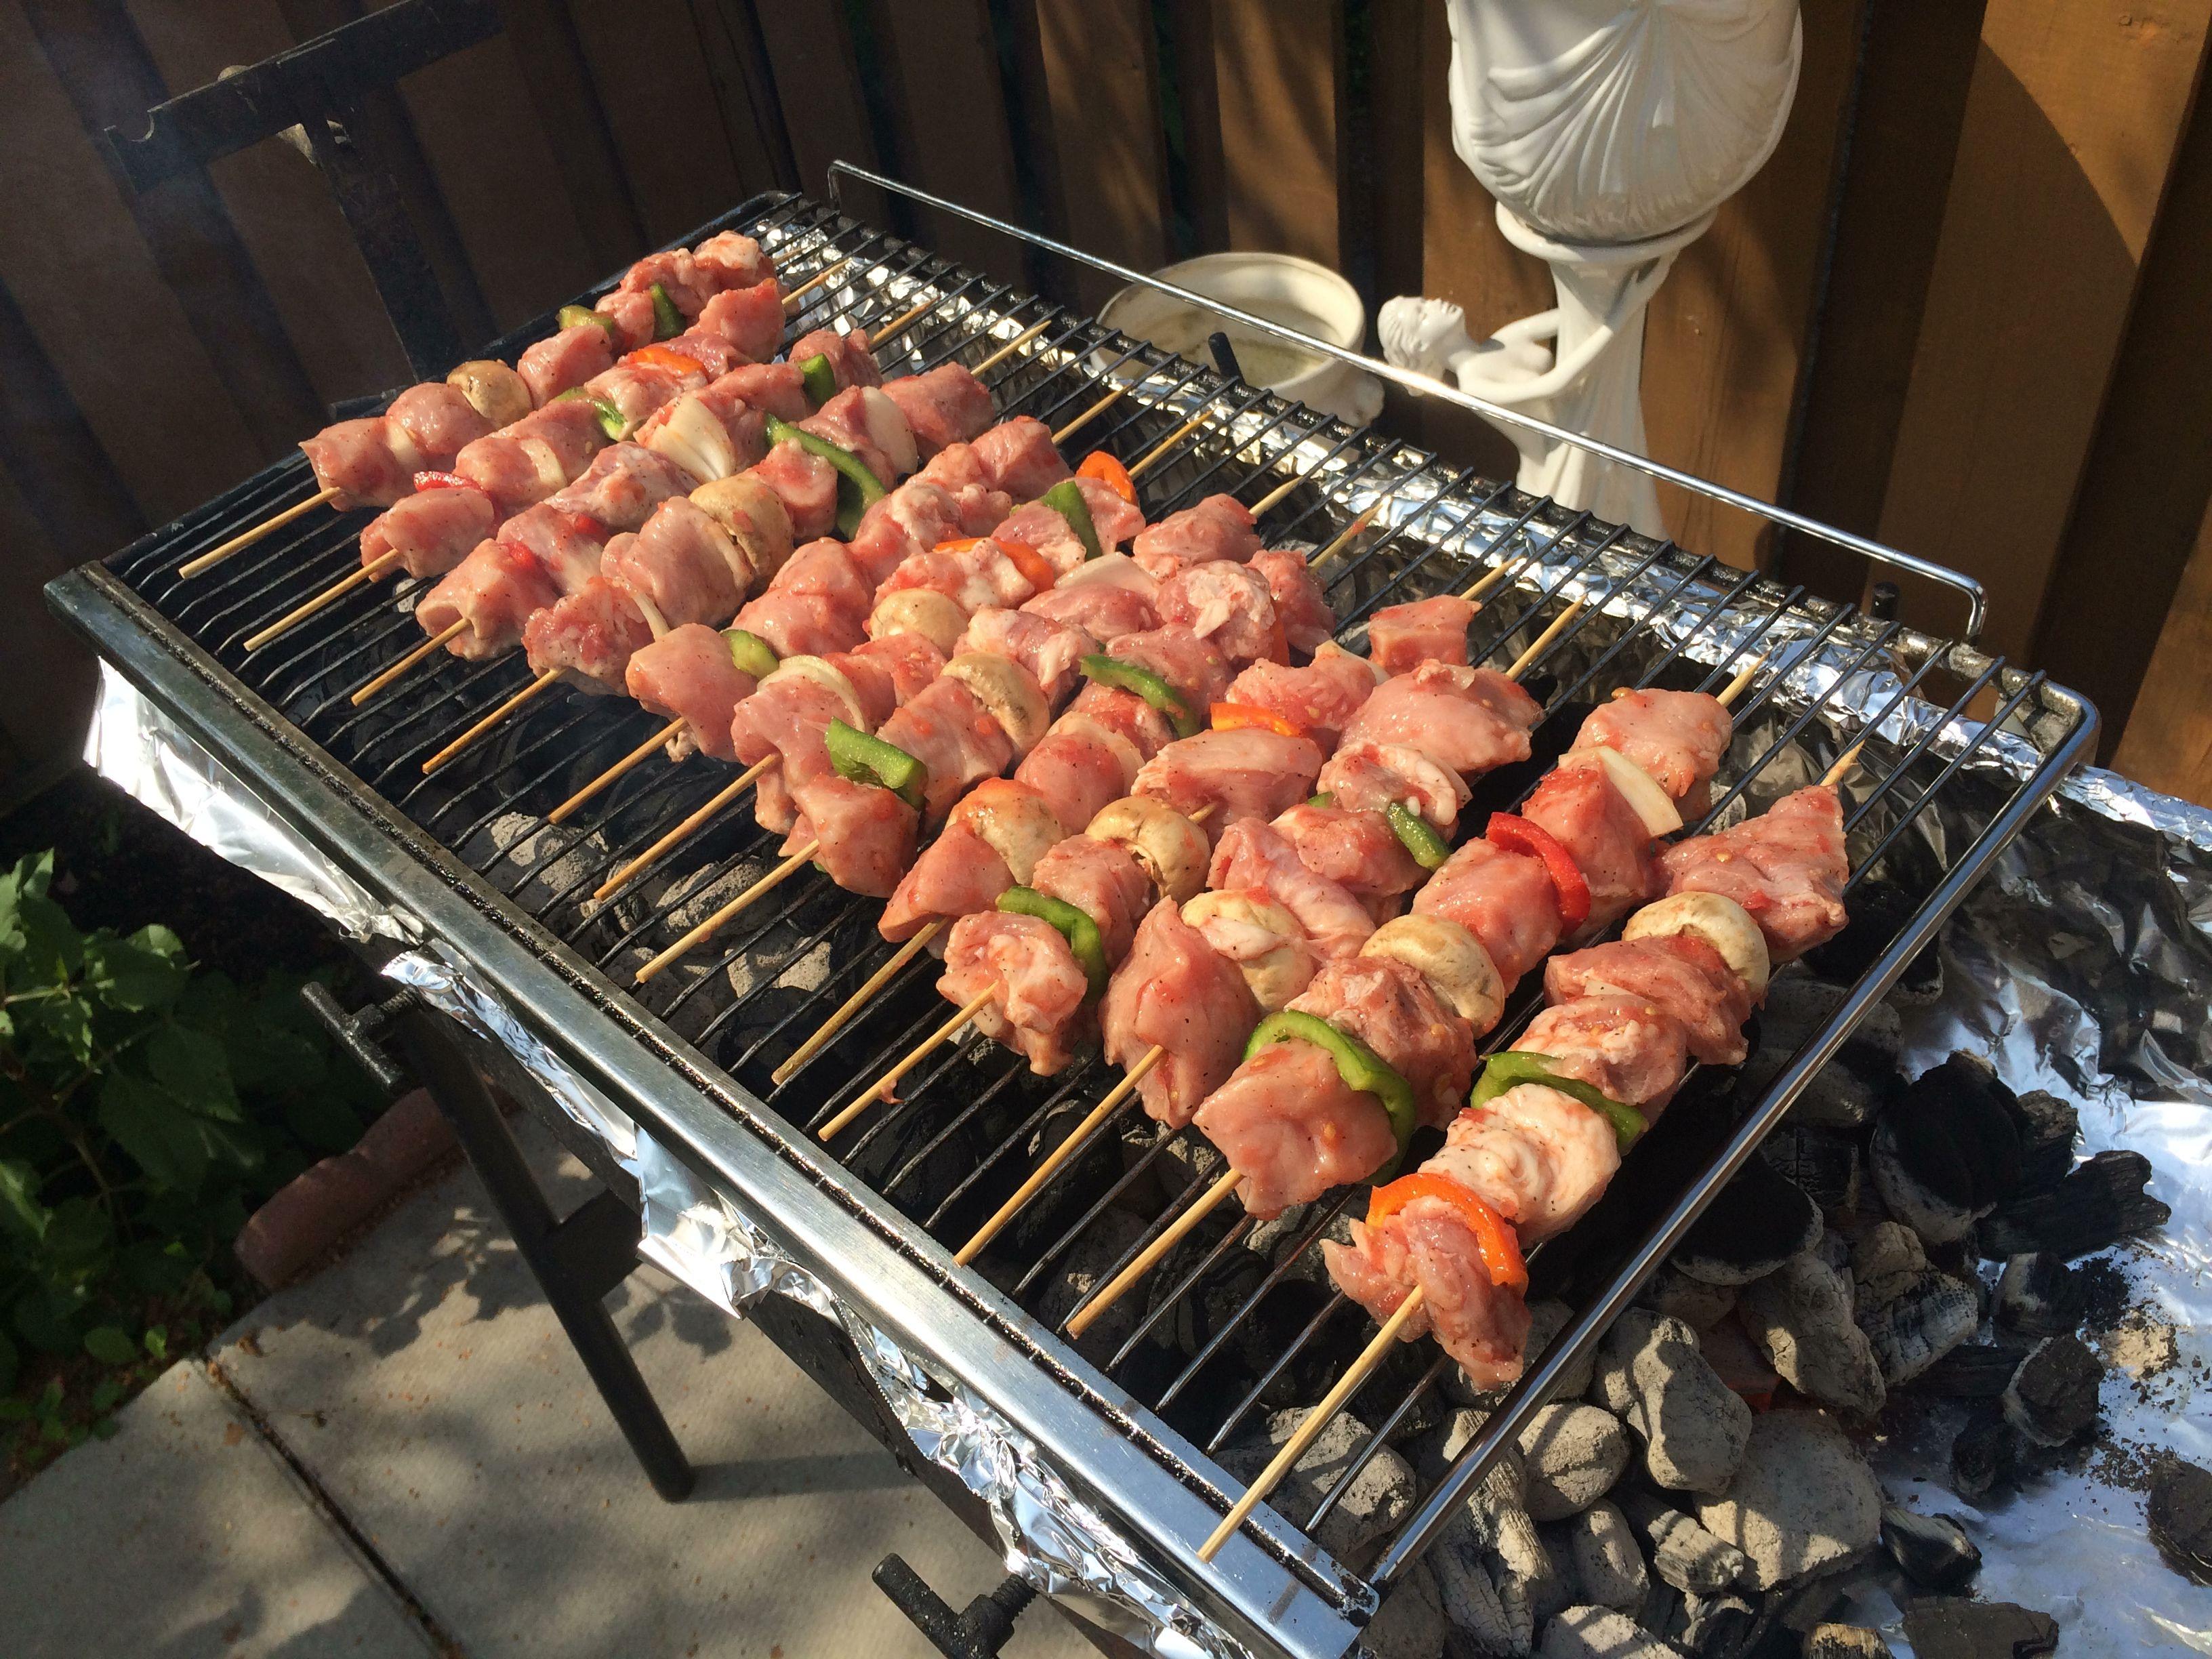 Pork Souvlaki! #eatwithyoureyes